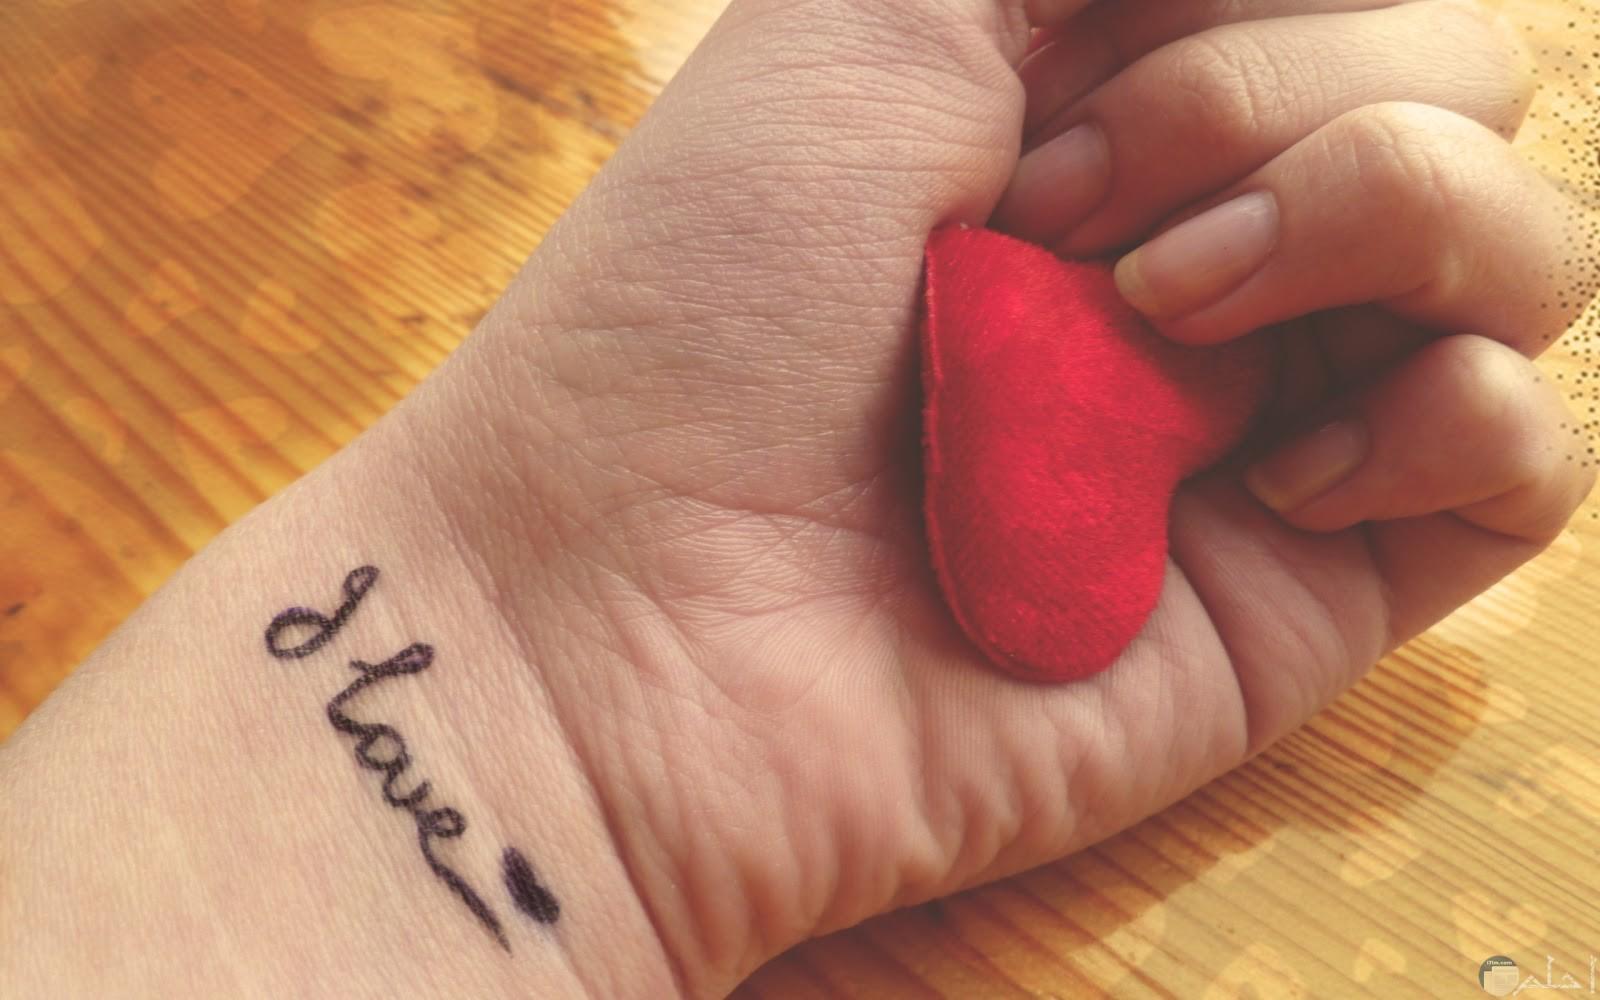 يد بها قلب احمر